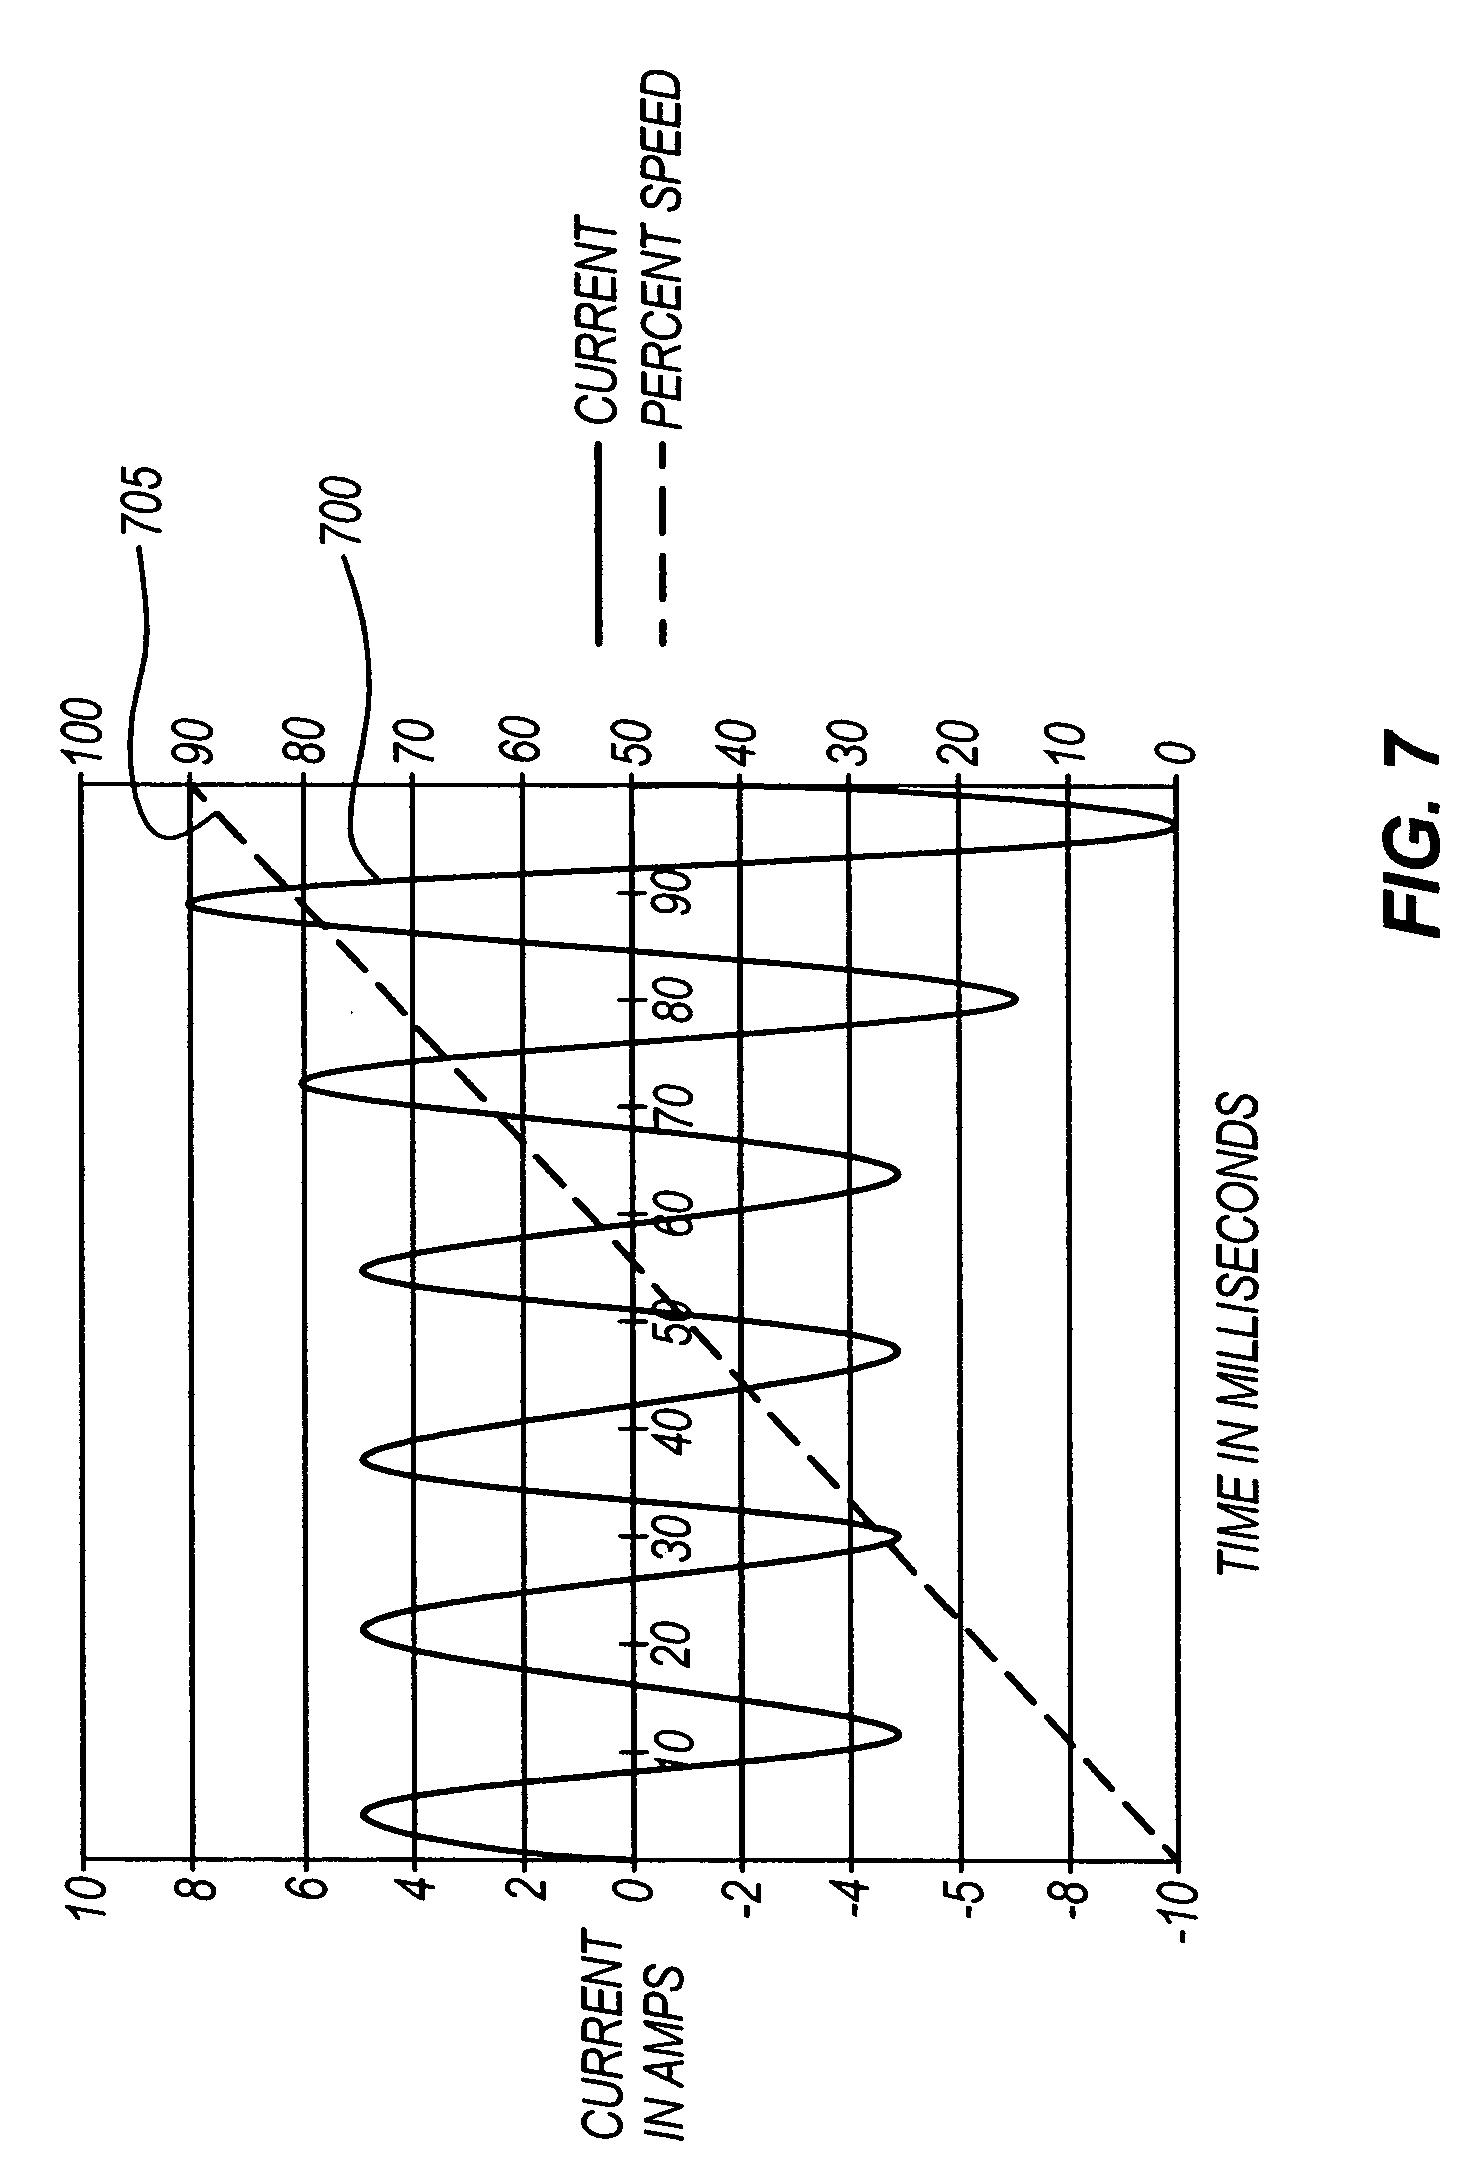 Ls1 Dual Fan Relay Wiring Diagram 96 Impala Sensor Diagram